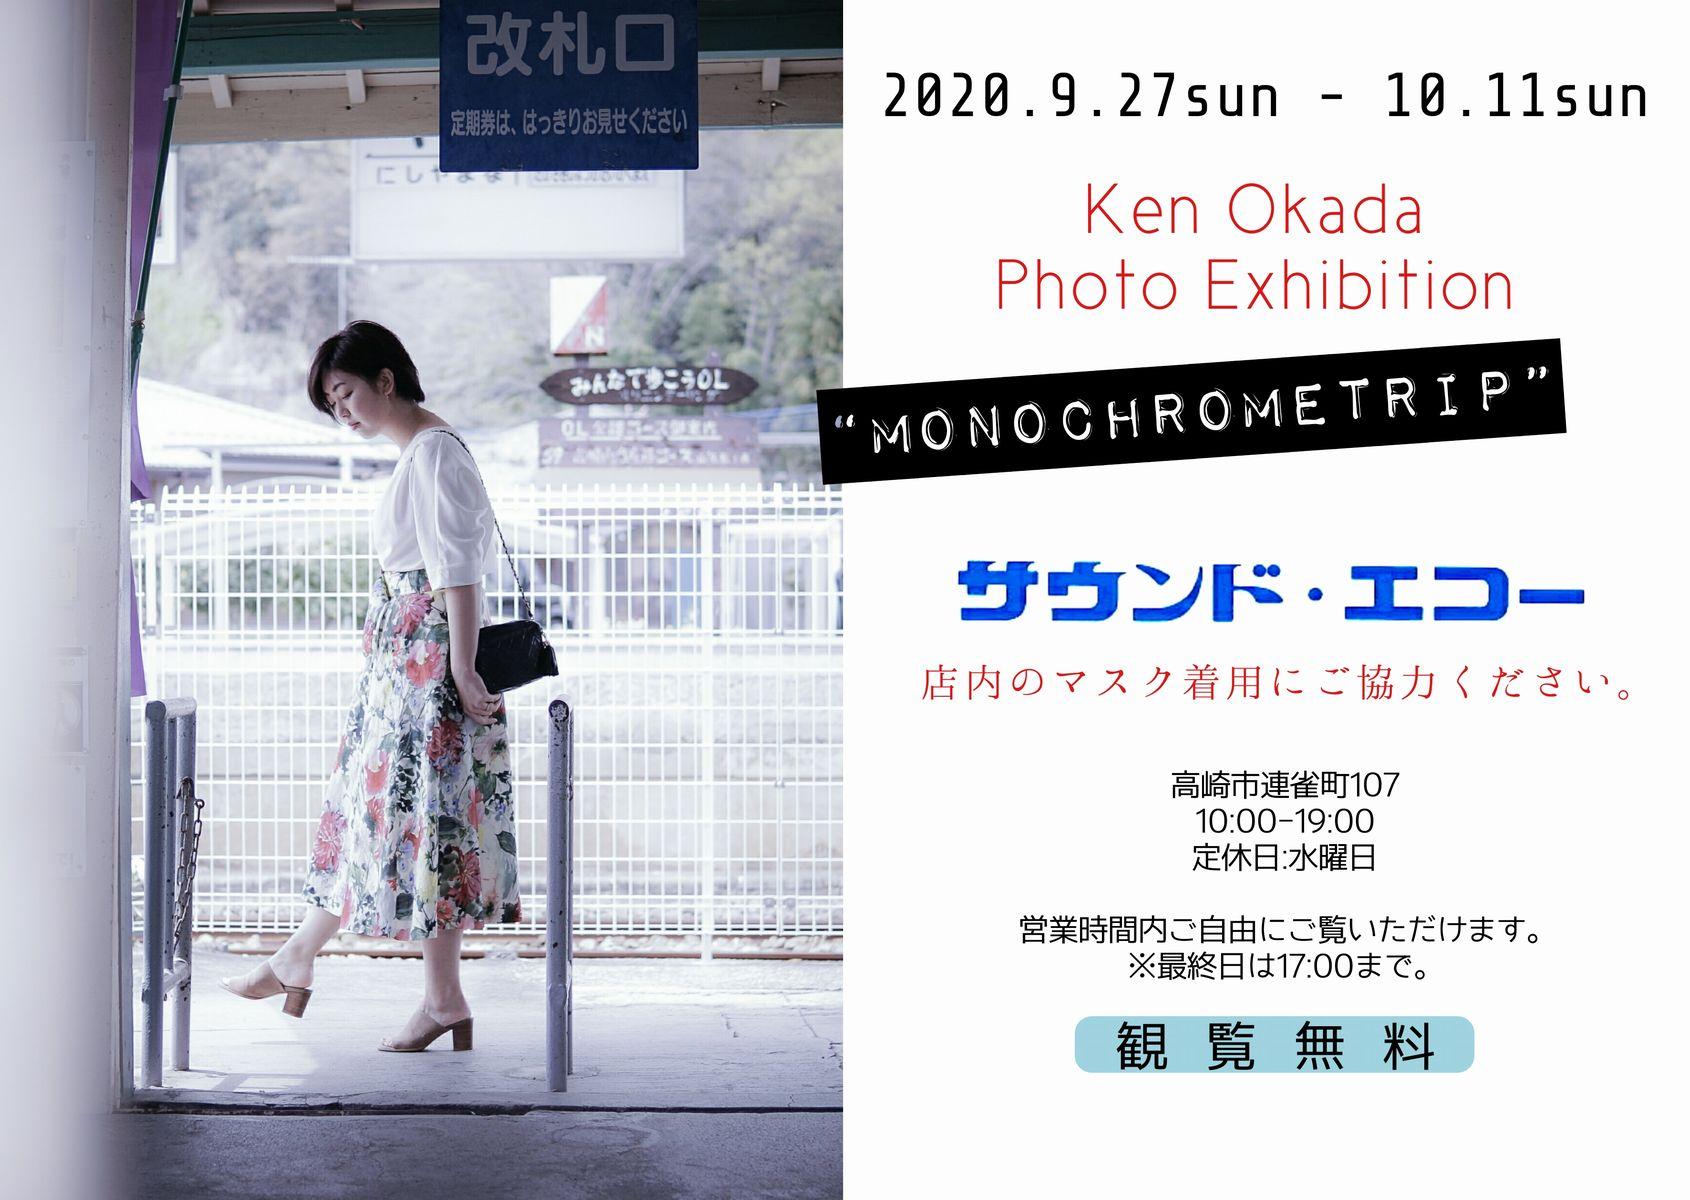 "Ken Okada Photo Exhibition ""MONOCHROME TRIP"" in サウンドエコー高崎_d0231029_17423557.jpg"